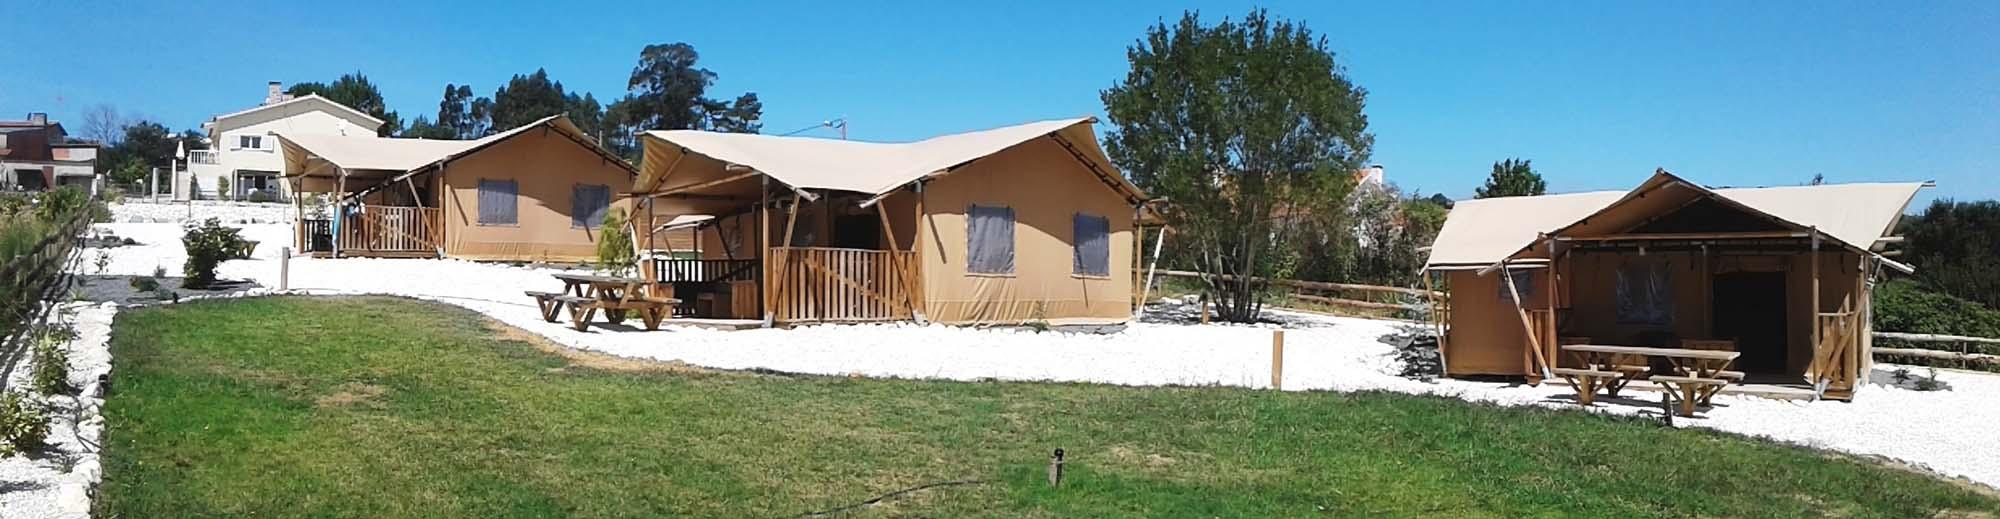 Sunair lodge - Tente safari lodge